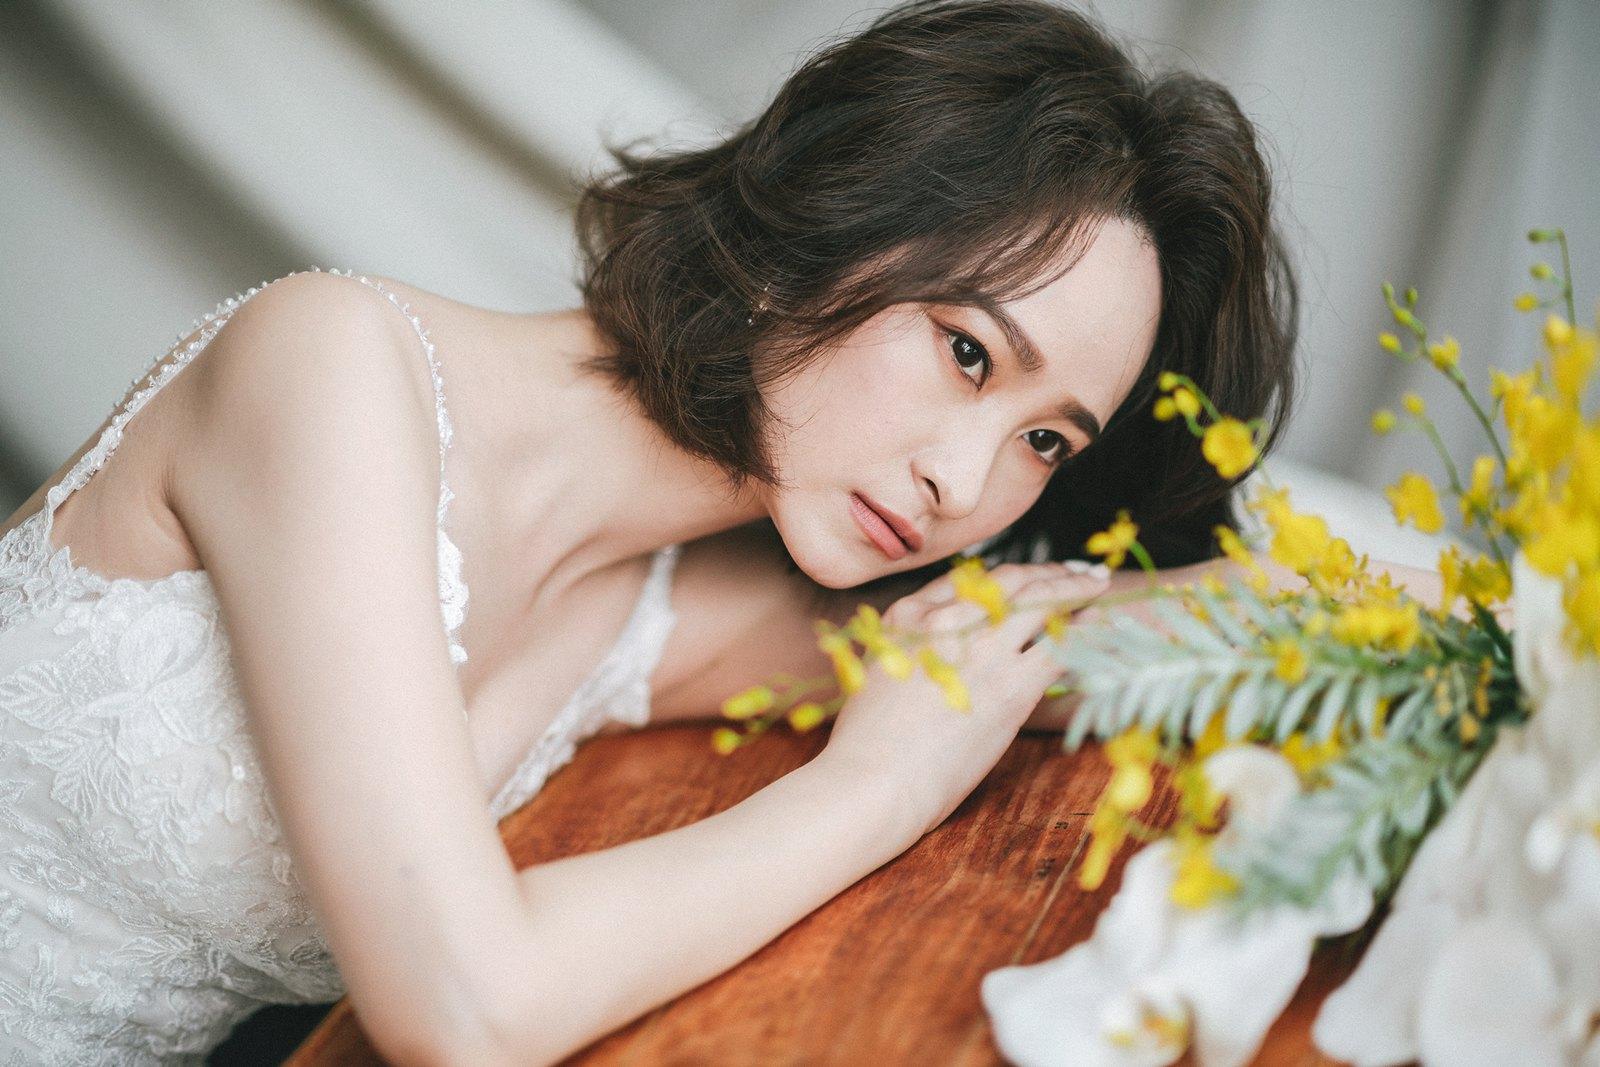 【婚紗】Peta / 婚紗意象 / EASTERN WEDDING studio